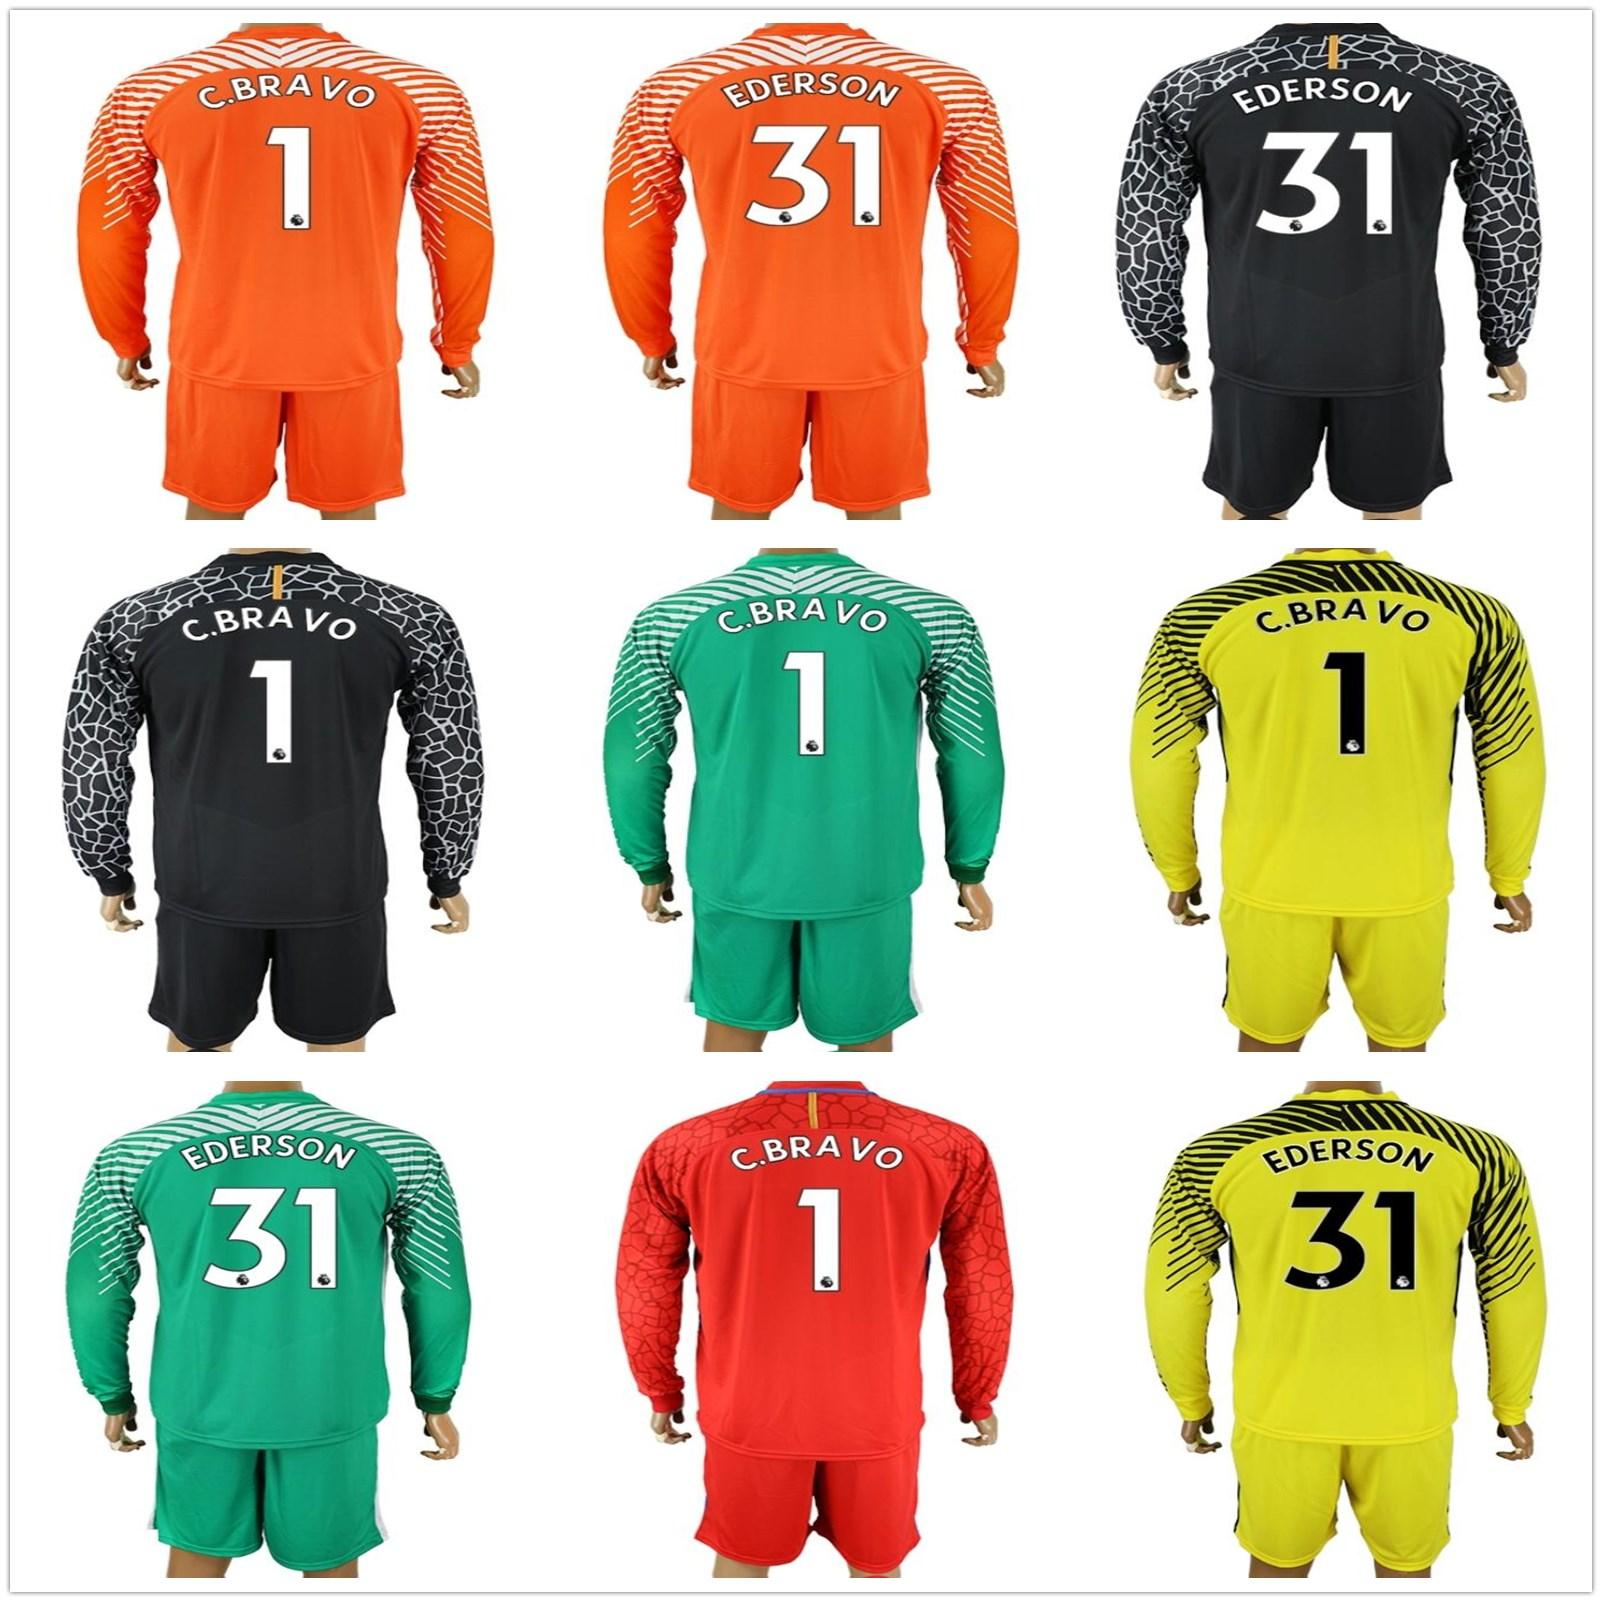 2018 2017 2018 long sleeve blue moon soccer jerseys claudio bravo goalkeeper jersey c. bravo ederson green orange adults uniforms football sets from